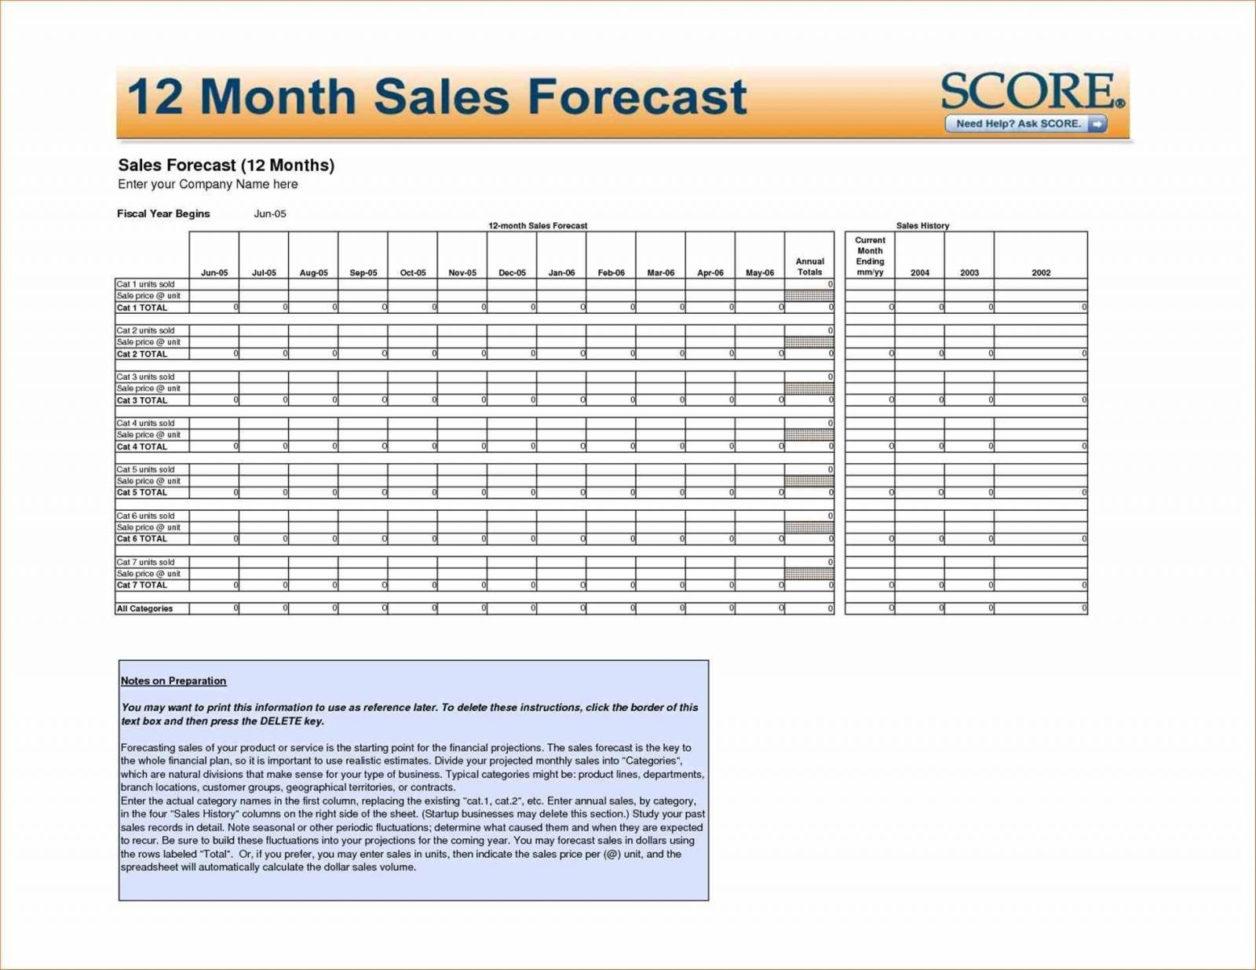 Capsim Forecastingeadsheet Inspirational Examples Sales Forecast In Sales Forecast Template Google Docs